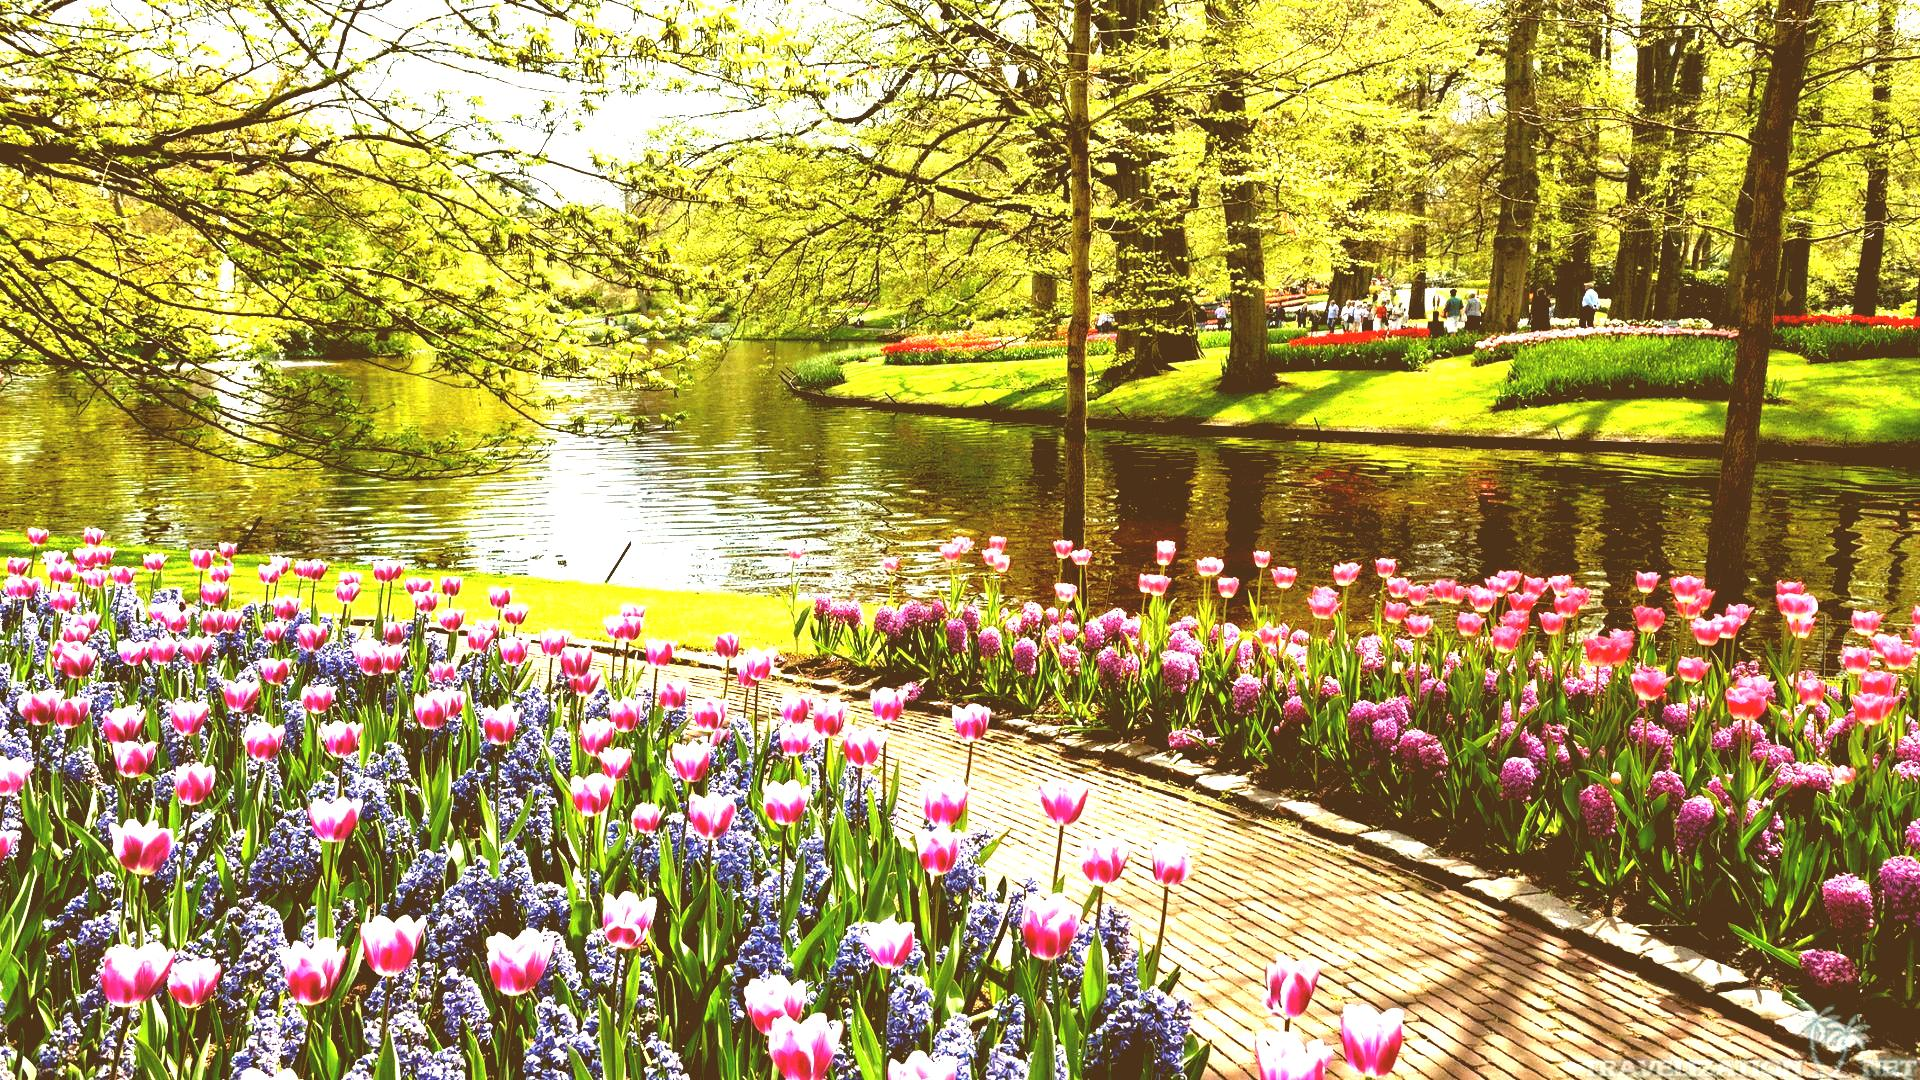 Download Beautiful Garden Solidaria Co Wallpapers Wallpaper Gardens ...